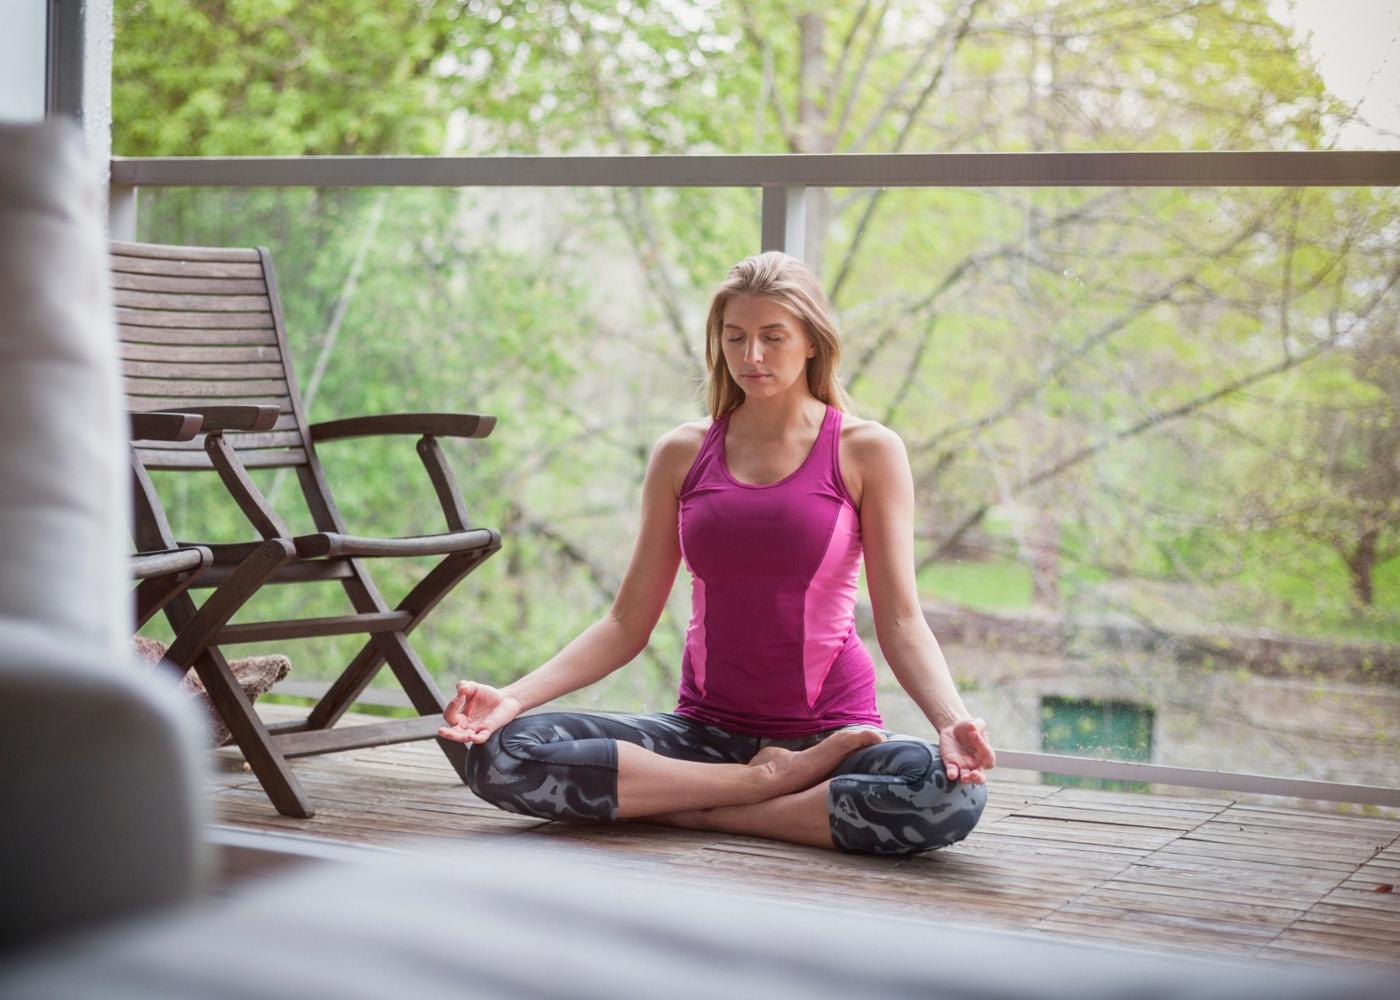 Mulher a meditar na varanda de casa